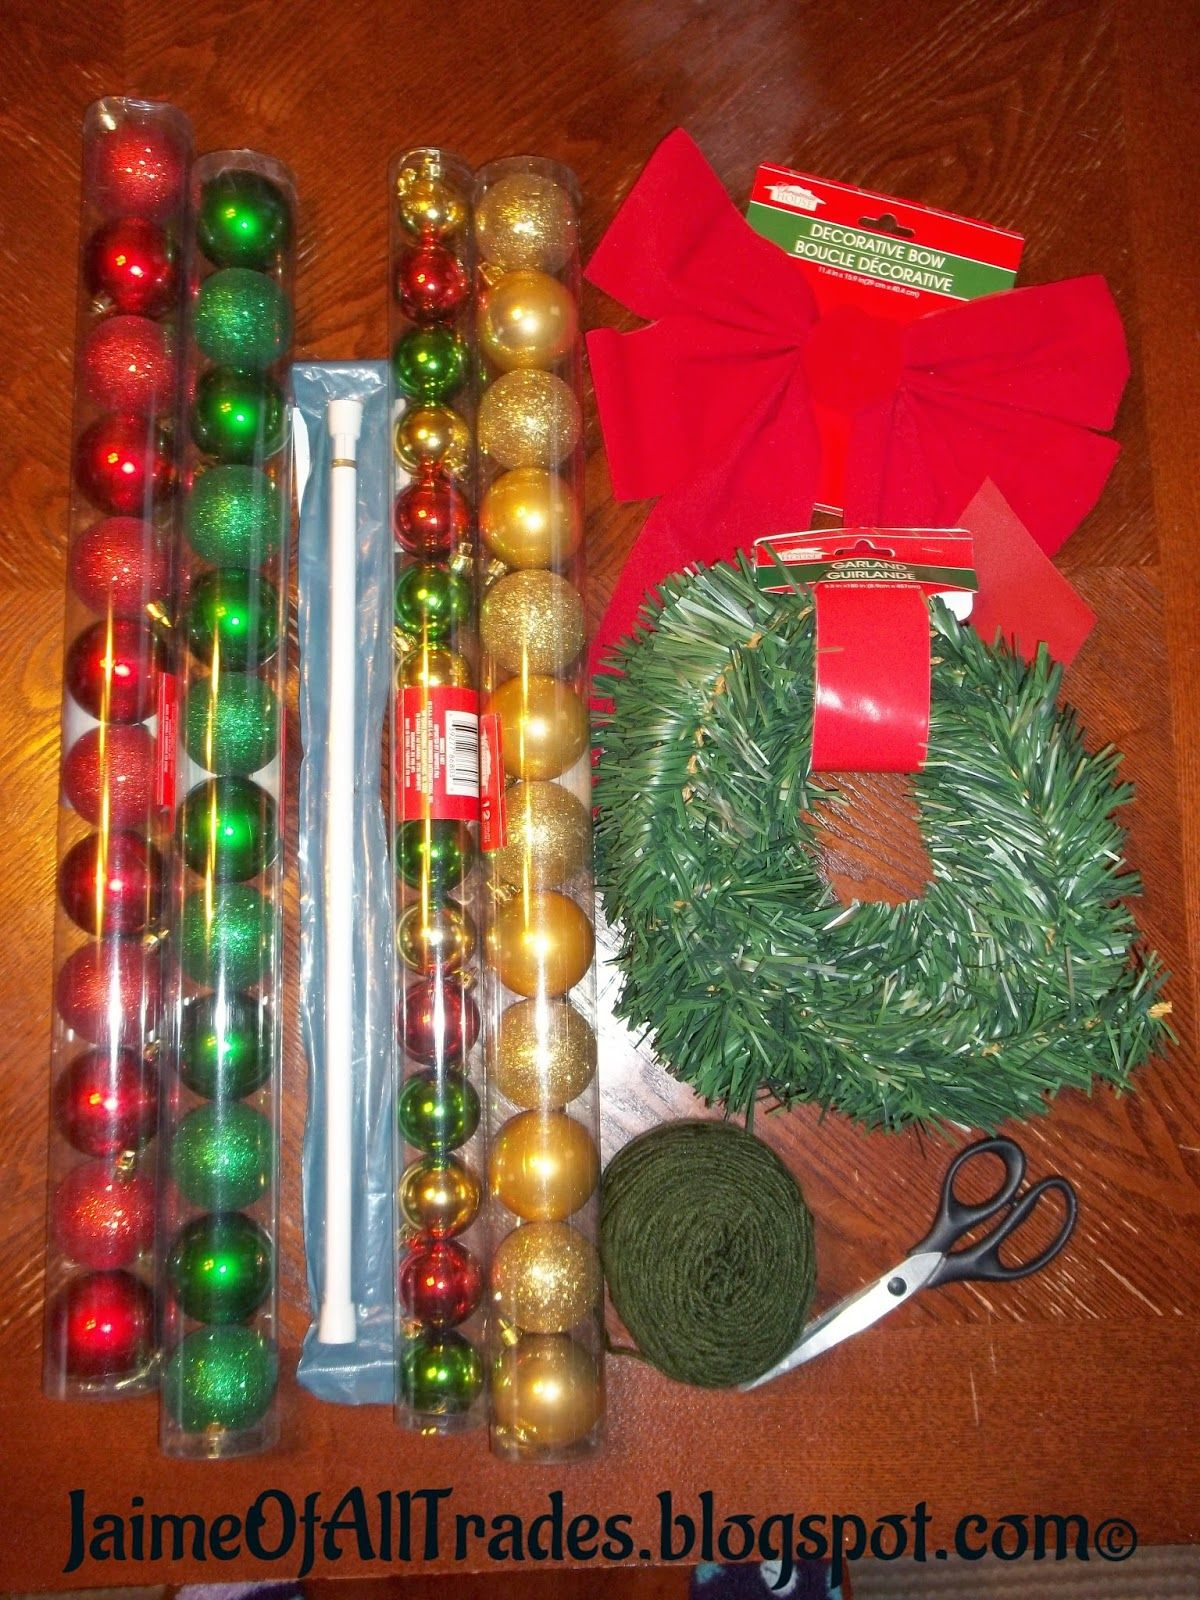 Jaime of all trades diy christmas window decorations